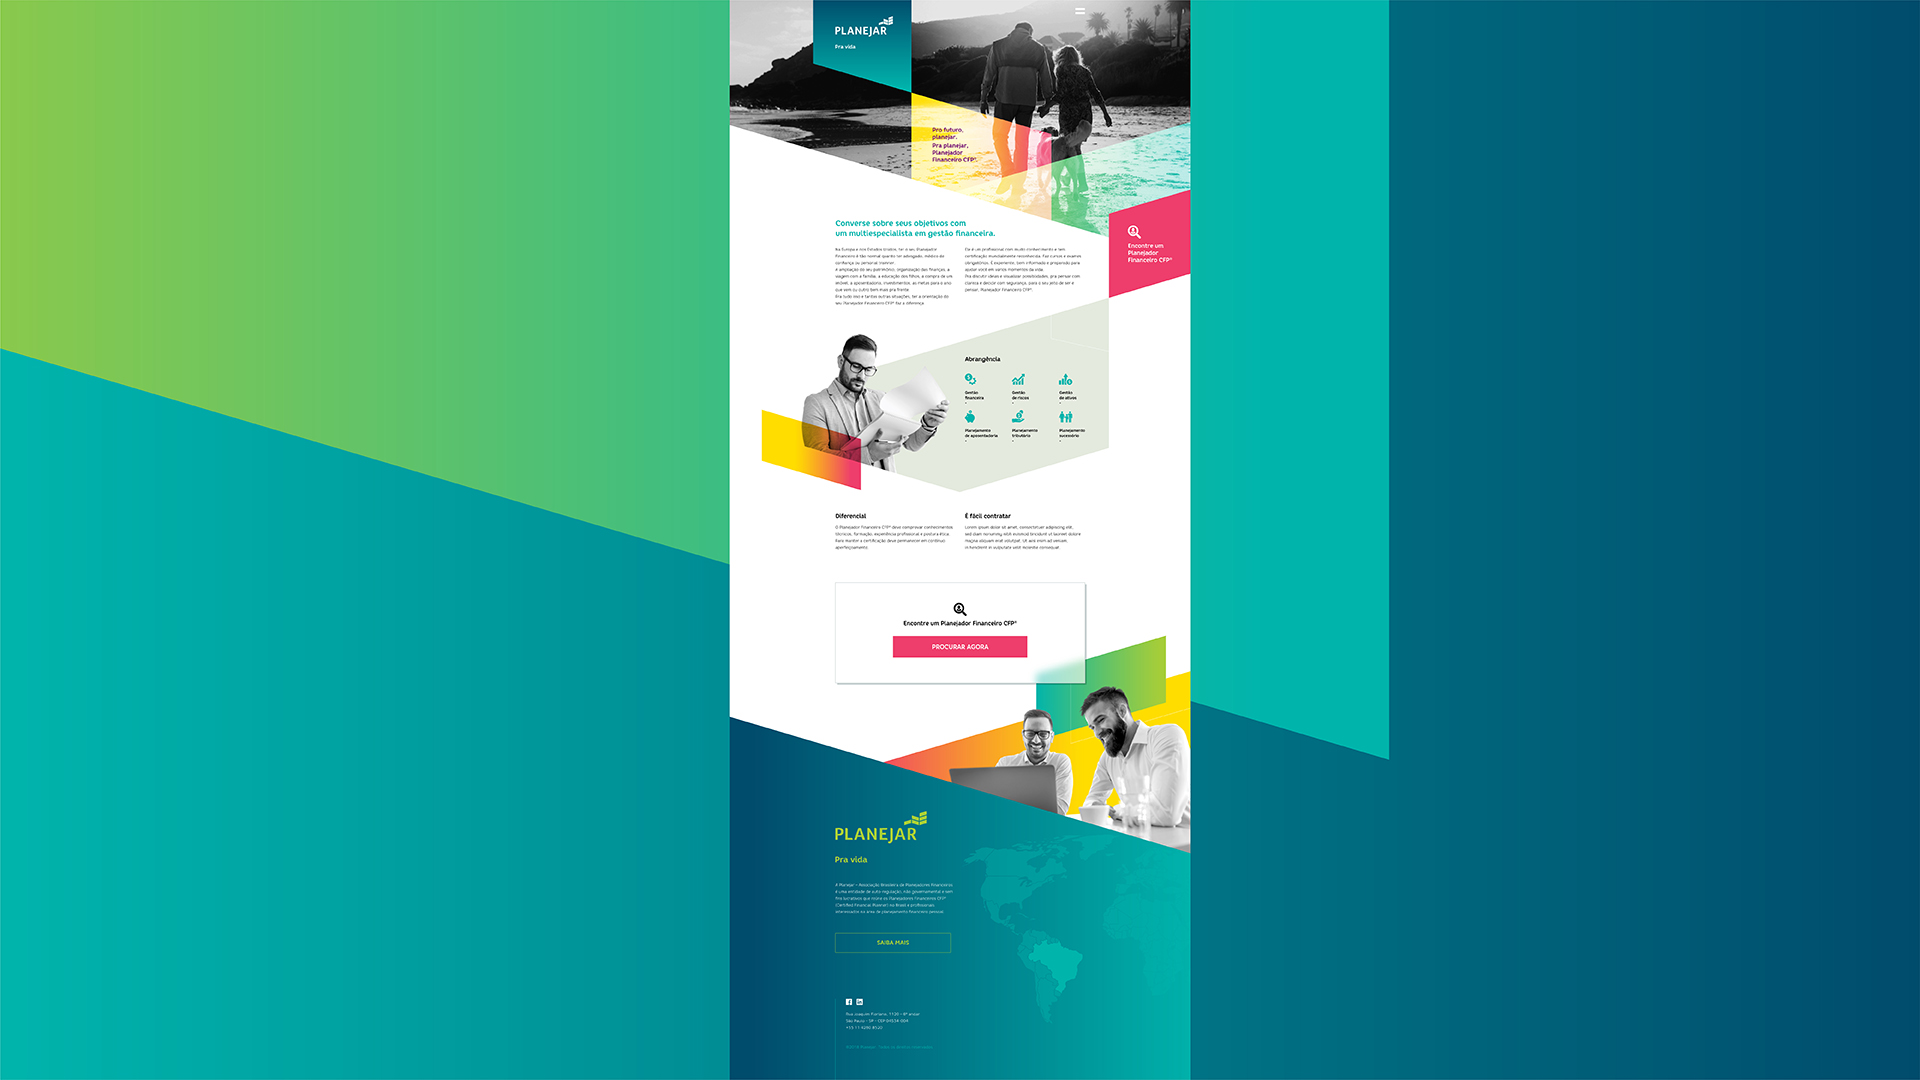 site-planejar-org.jpg